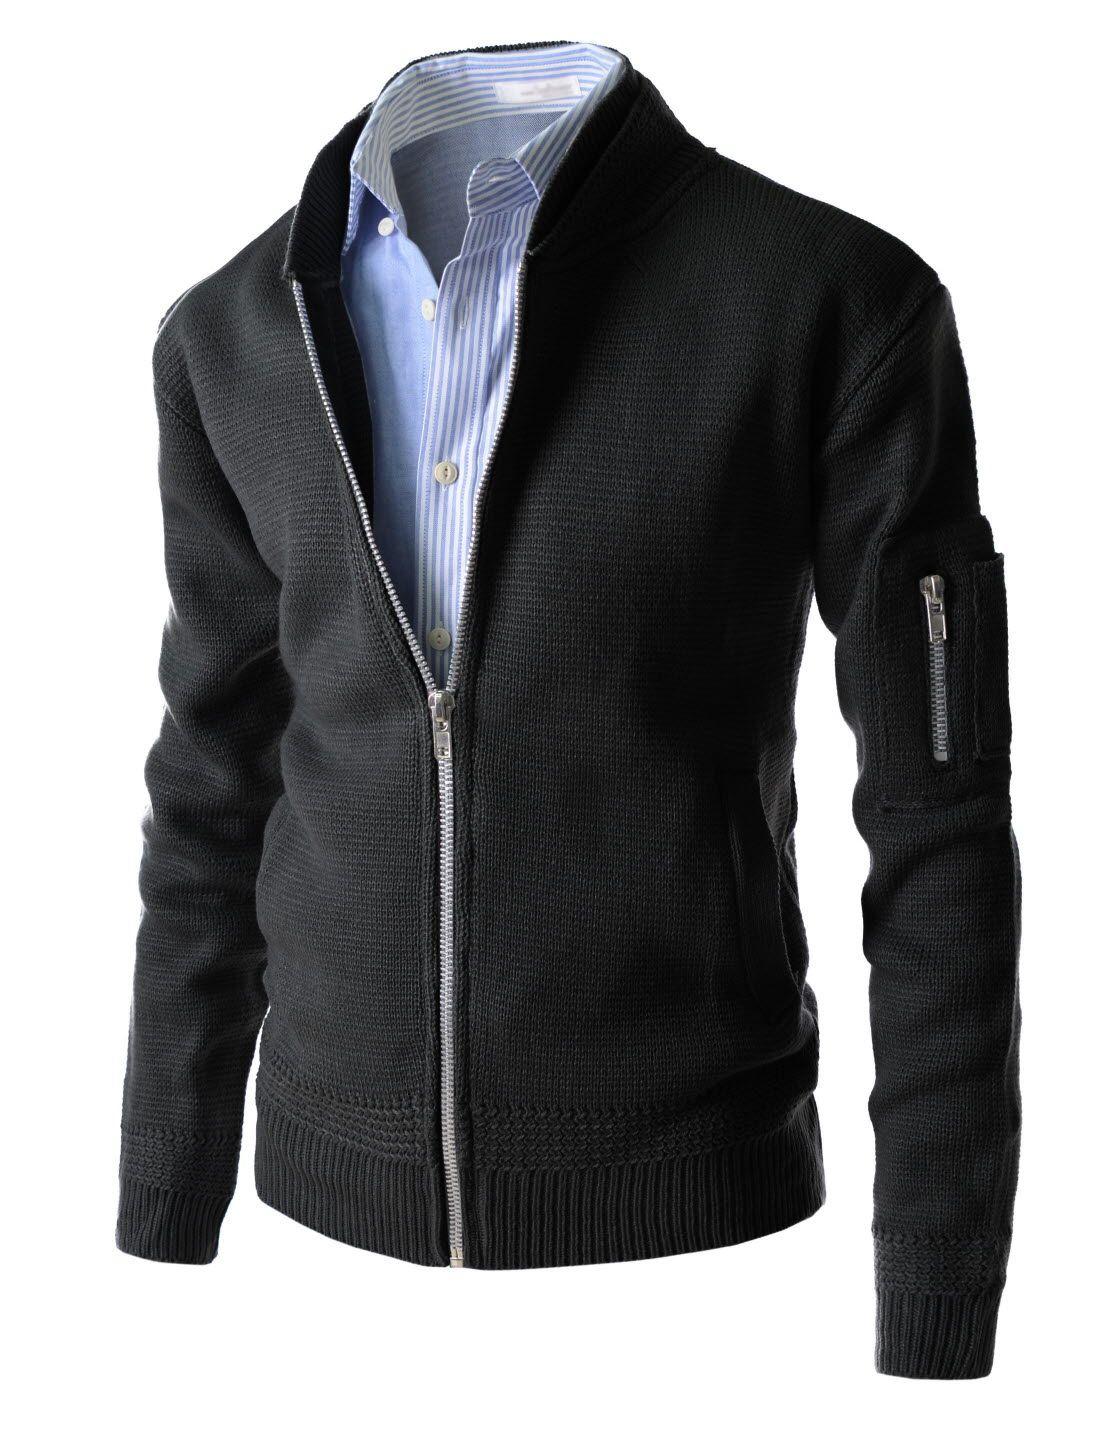 Bomber Jacket Style Double Neck Zipup Long Sleeve Blouson